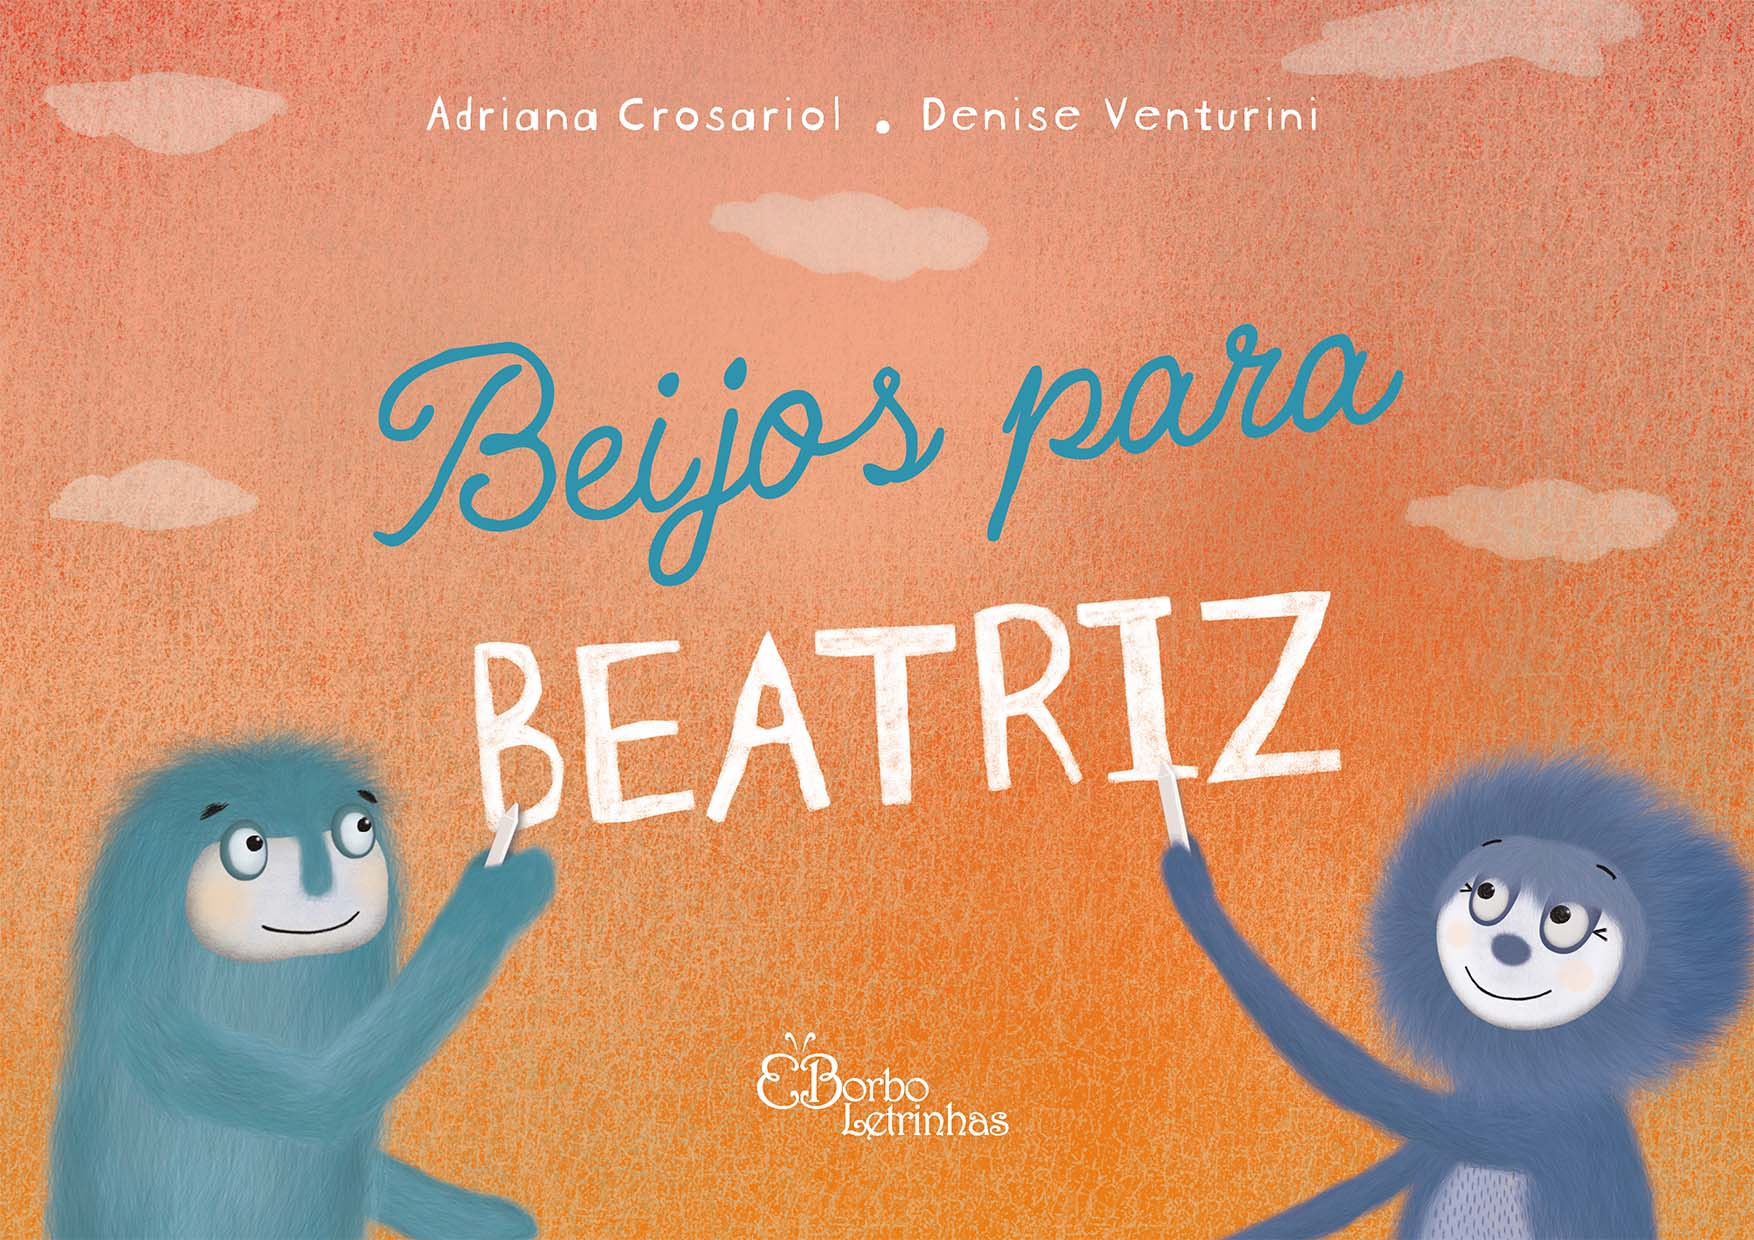 Beijos para Beatriz